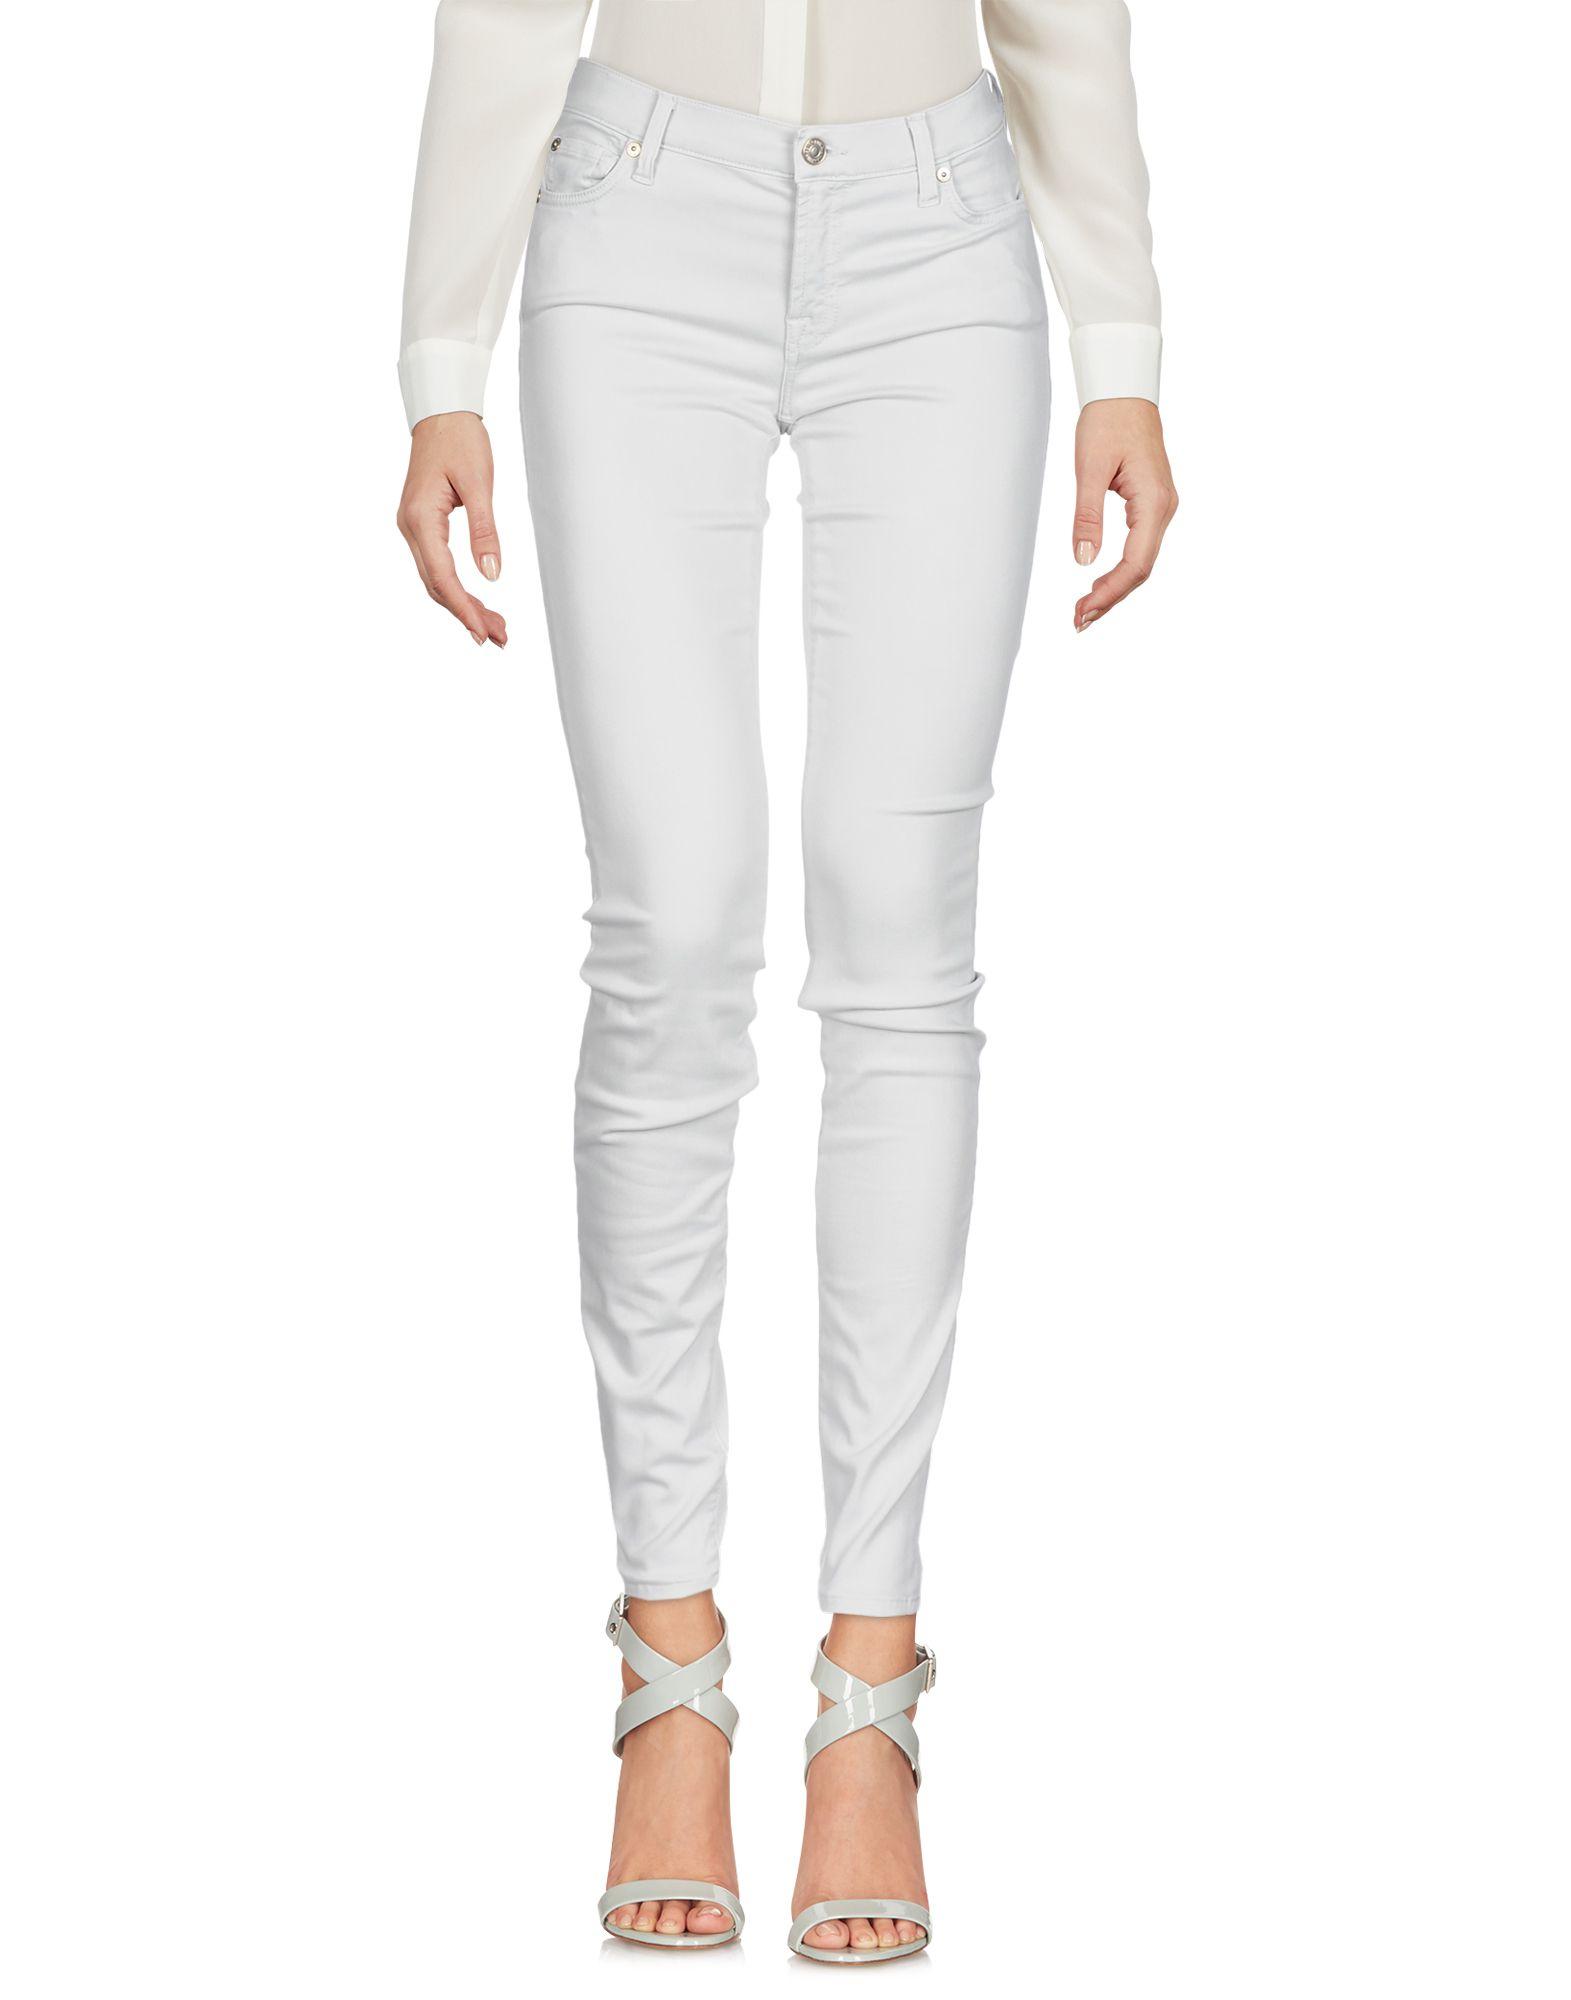 Pantalone 7 For All Mankind Donna - Acquista online su b86QmSdn